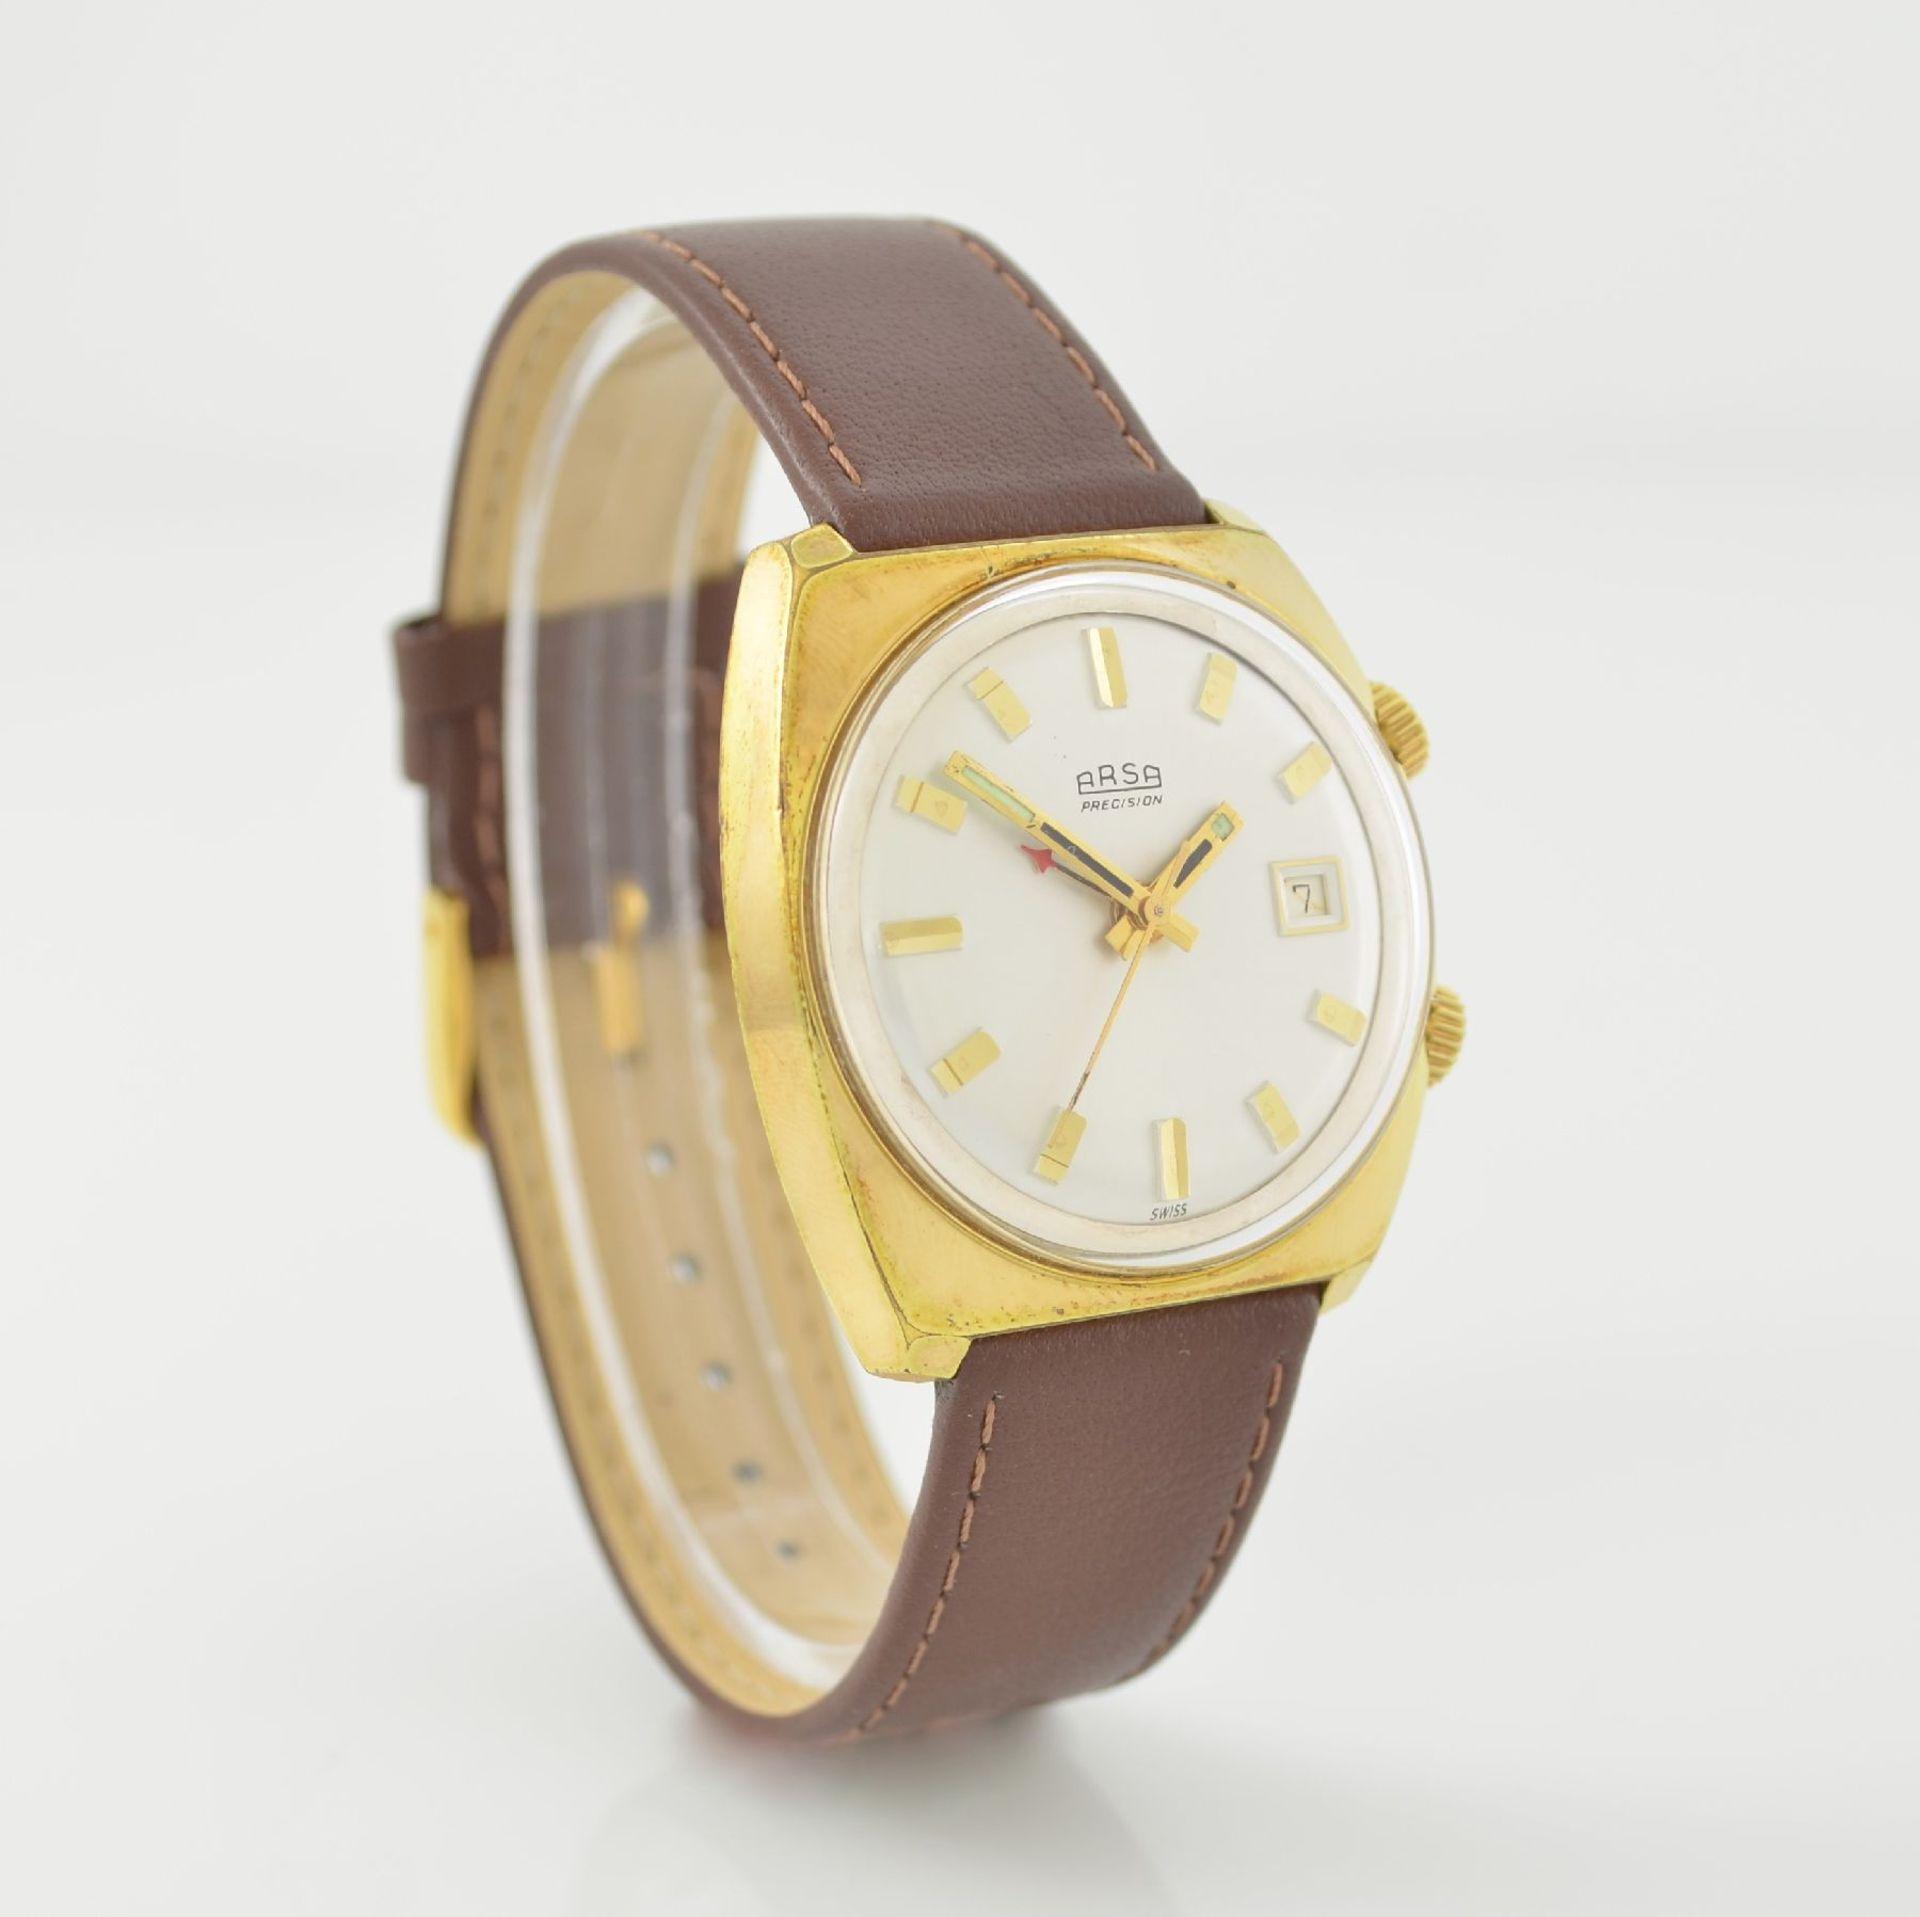 Konvolut: 2 Armbanduhren, beide Schweiz um 1970, beide Metall verg., 1 x Arsa Armbandwecker, Boden - Bild 4 aus 12